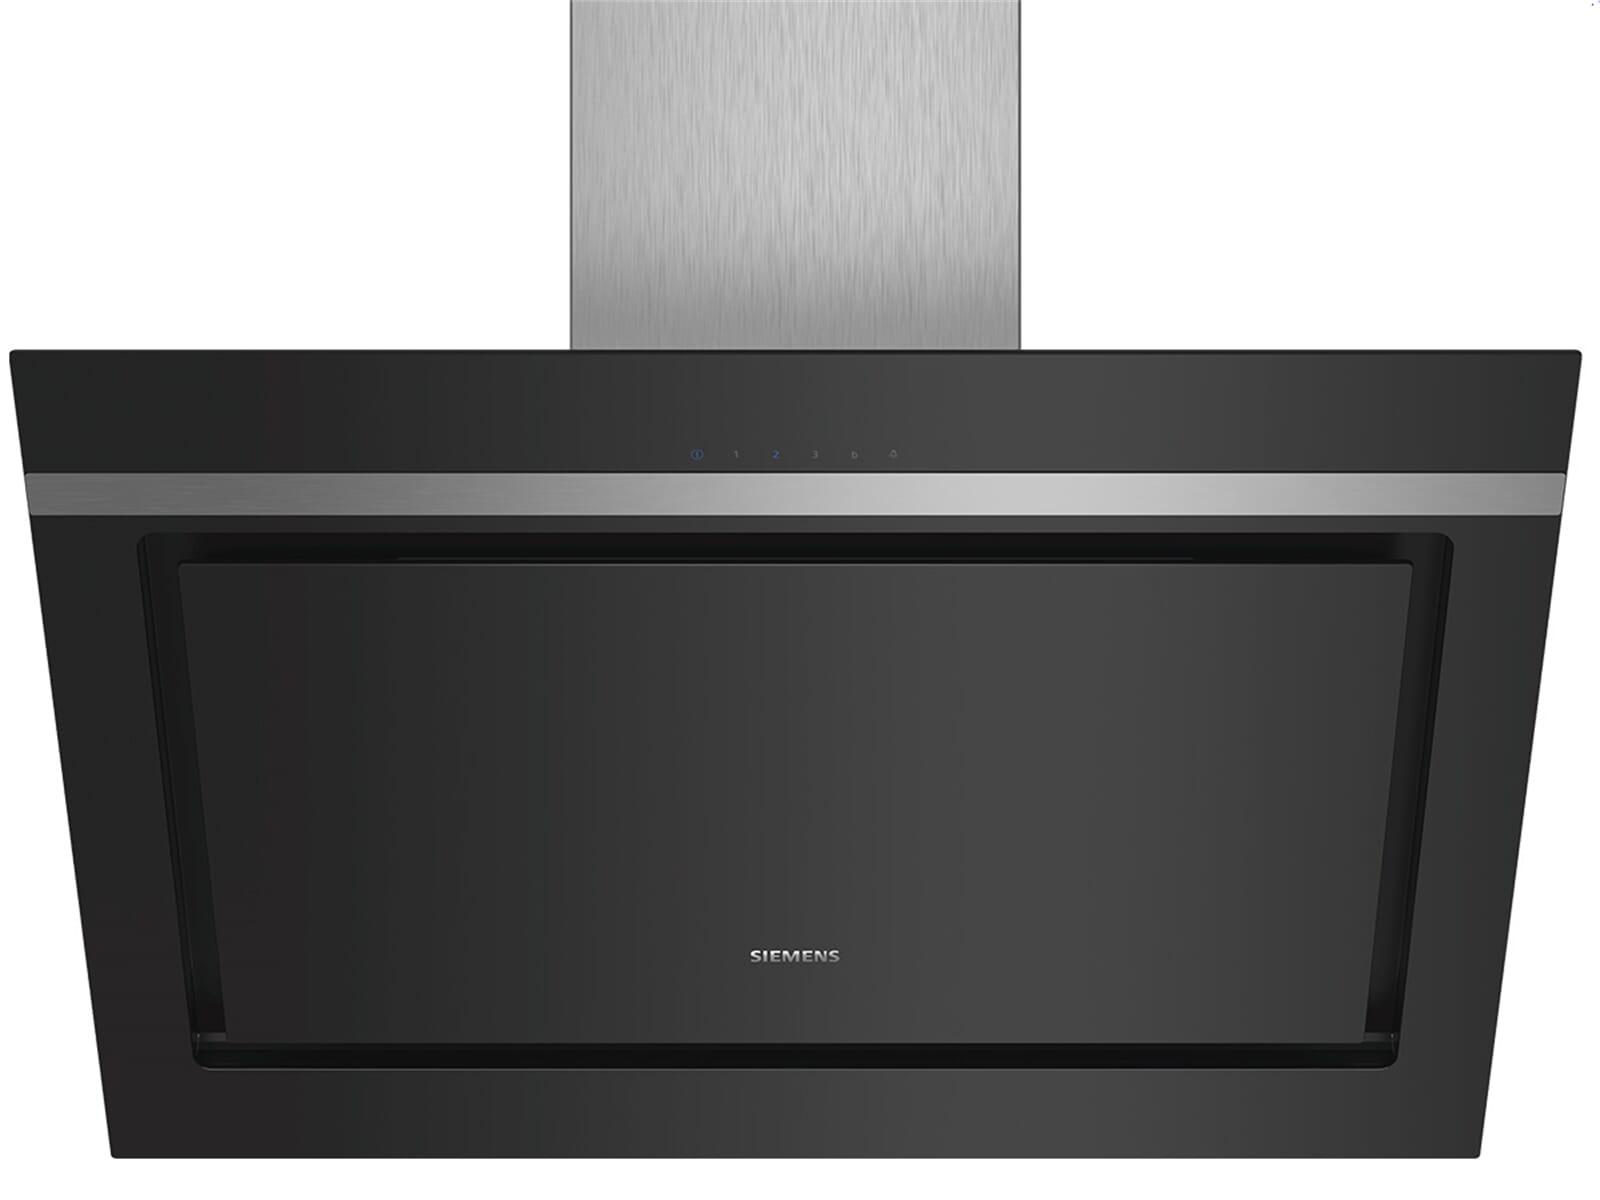 Siemens Kühlschrank Display Al : Siemens lc kim kopffreihaube schwarz